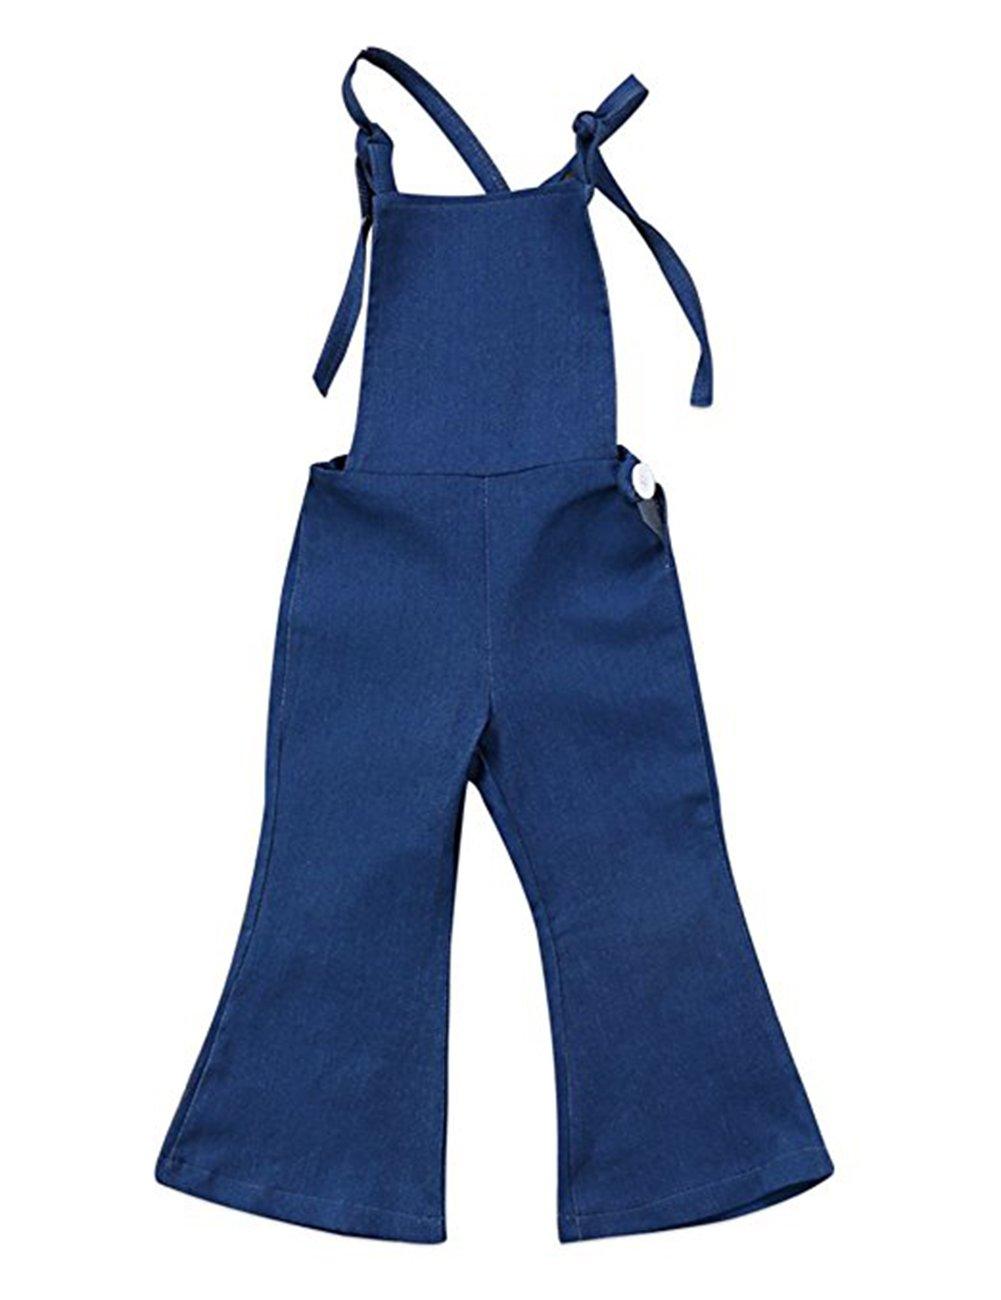 KONIGHT Baby Girls Little Kids Suspender Overall Flared Denim Jeans Jumpsuit Bell Elastic Blue Pants (Blue, 3-4Years)